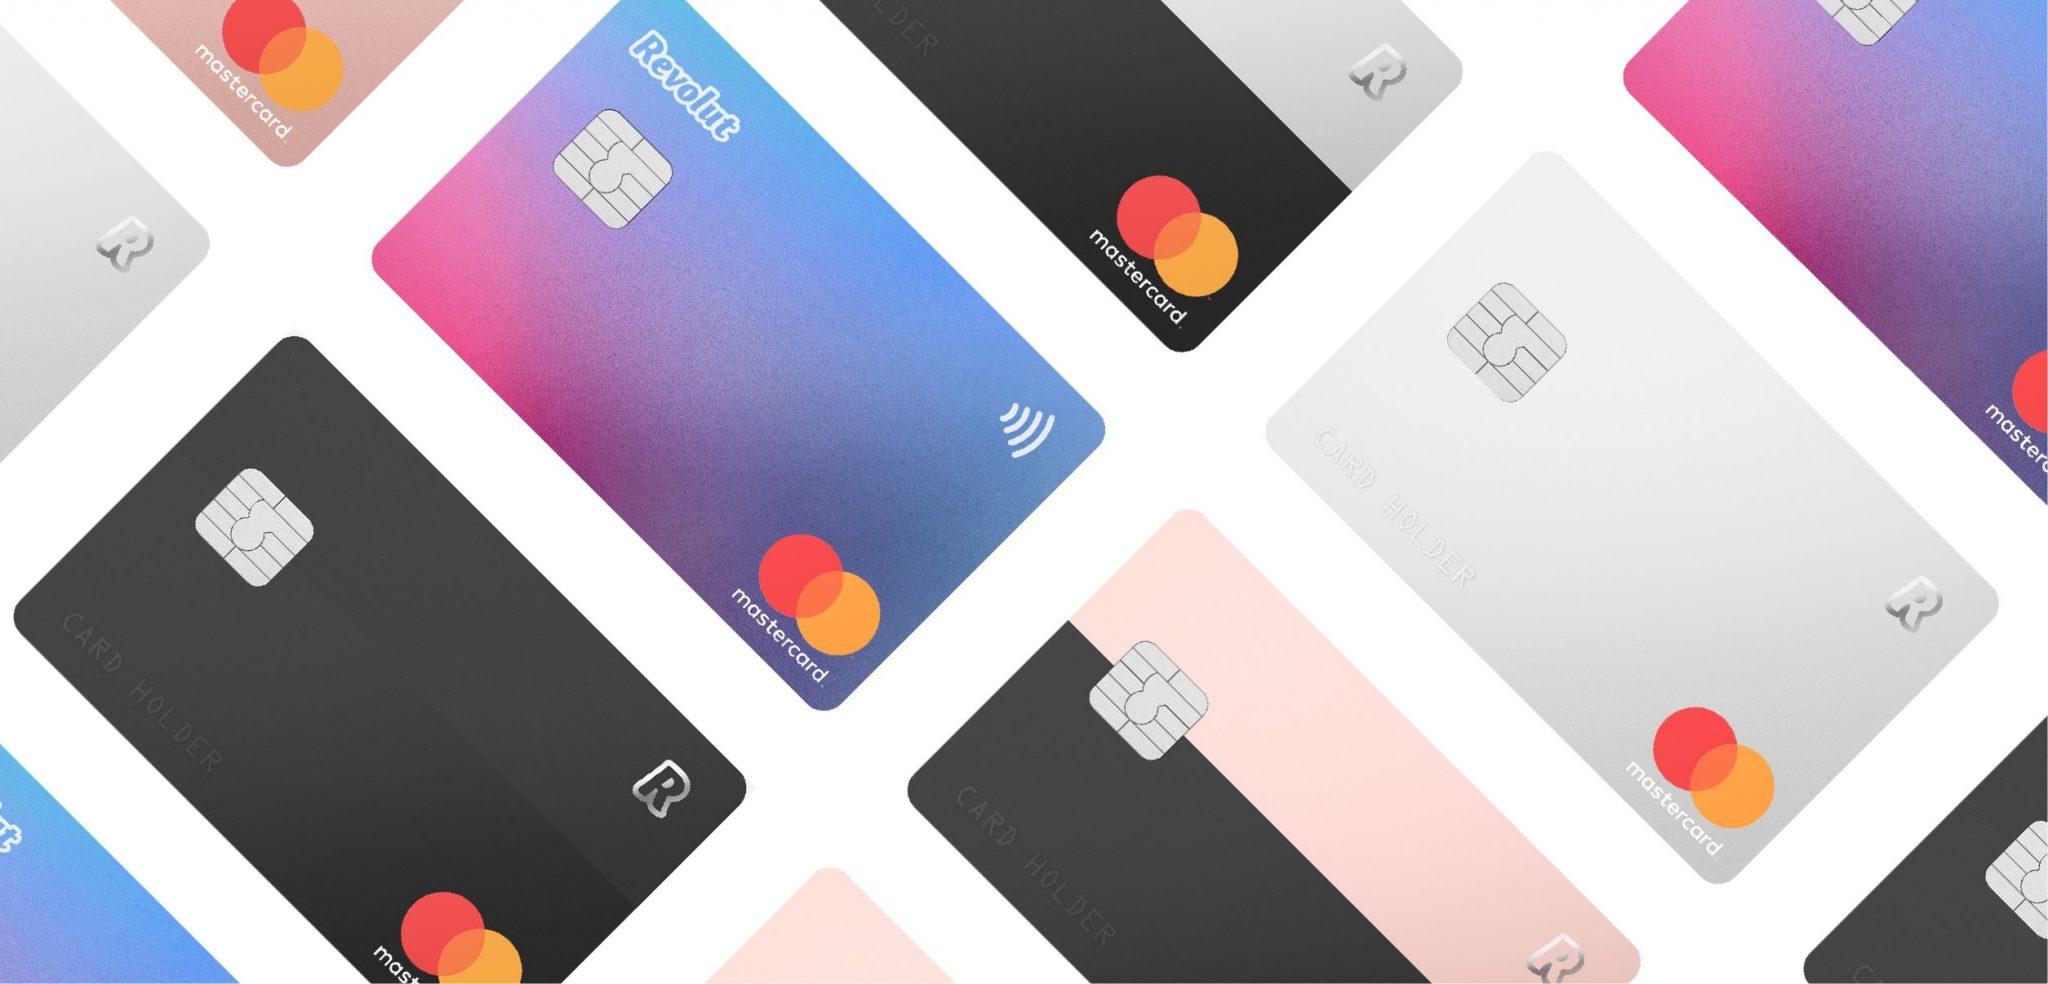 Revolut cards